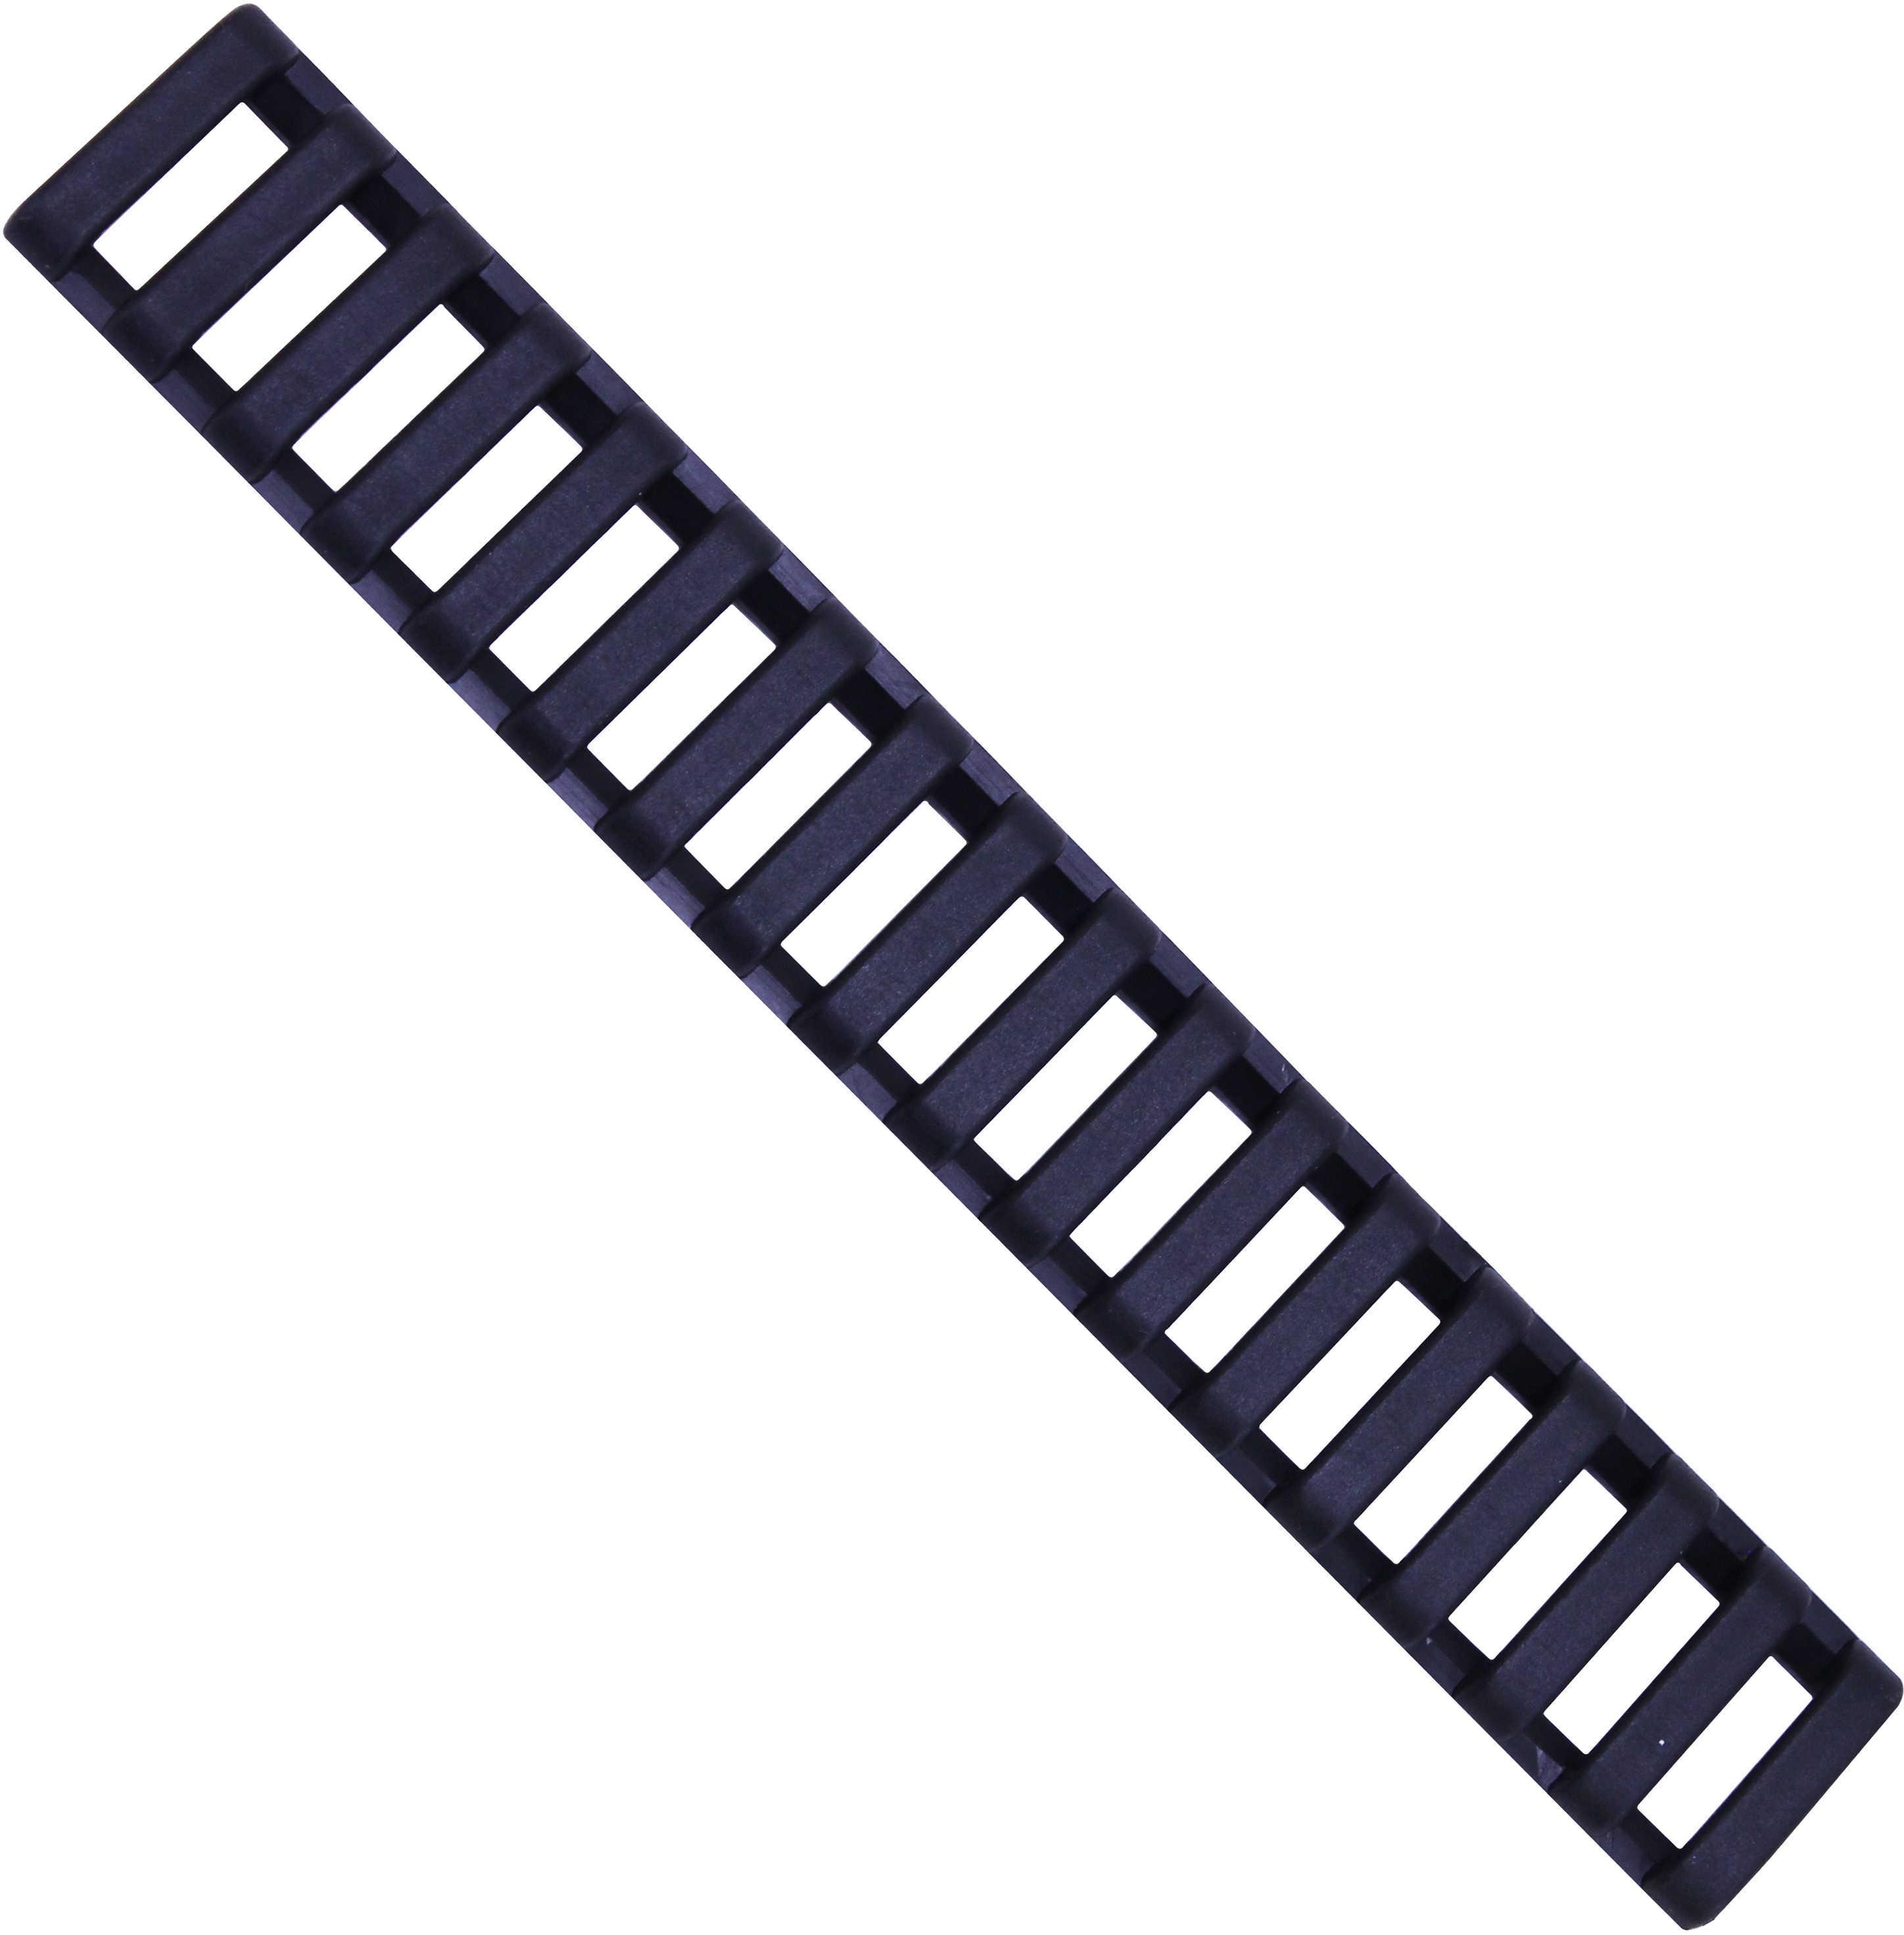 18 Slot Ladder Low Pro Rail Covers, 3-Pack Black Md: 4373-3Pk-Bk